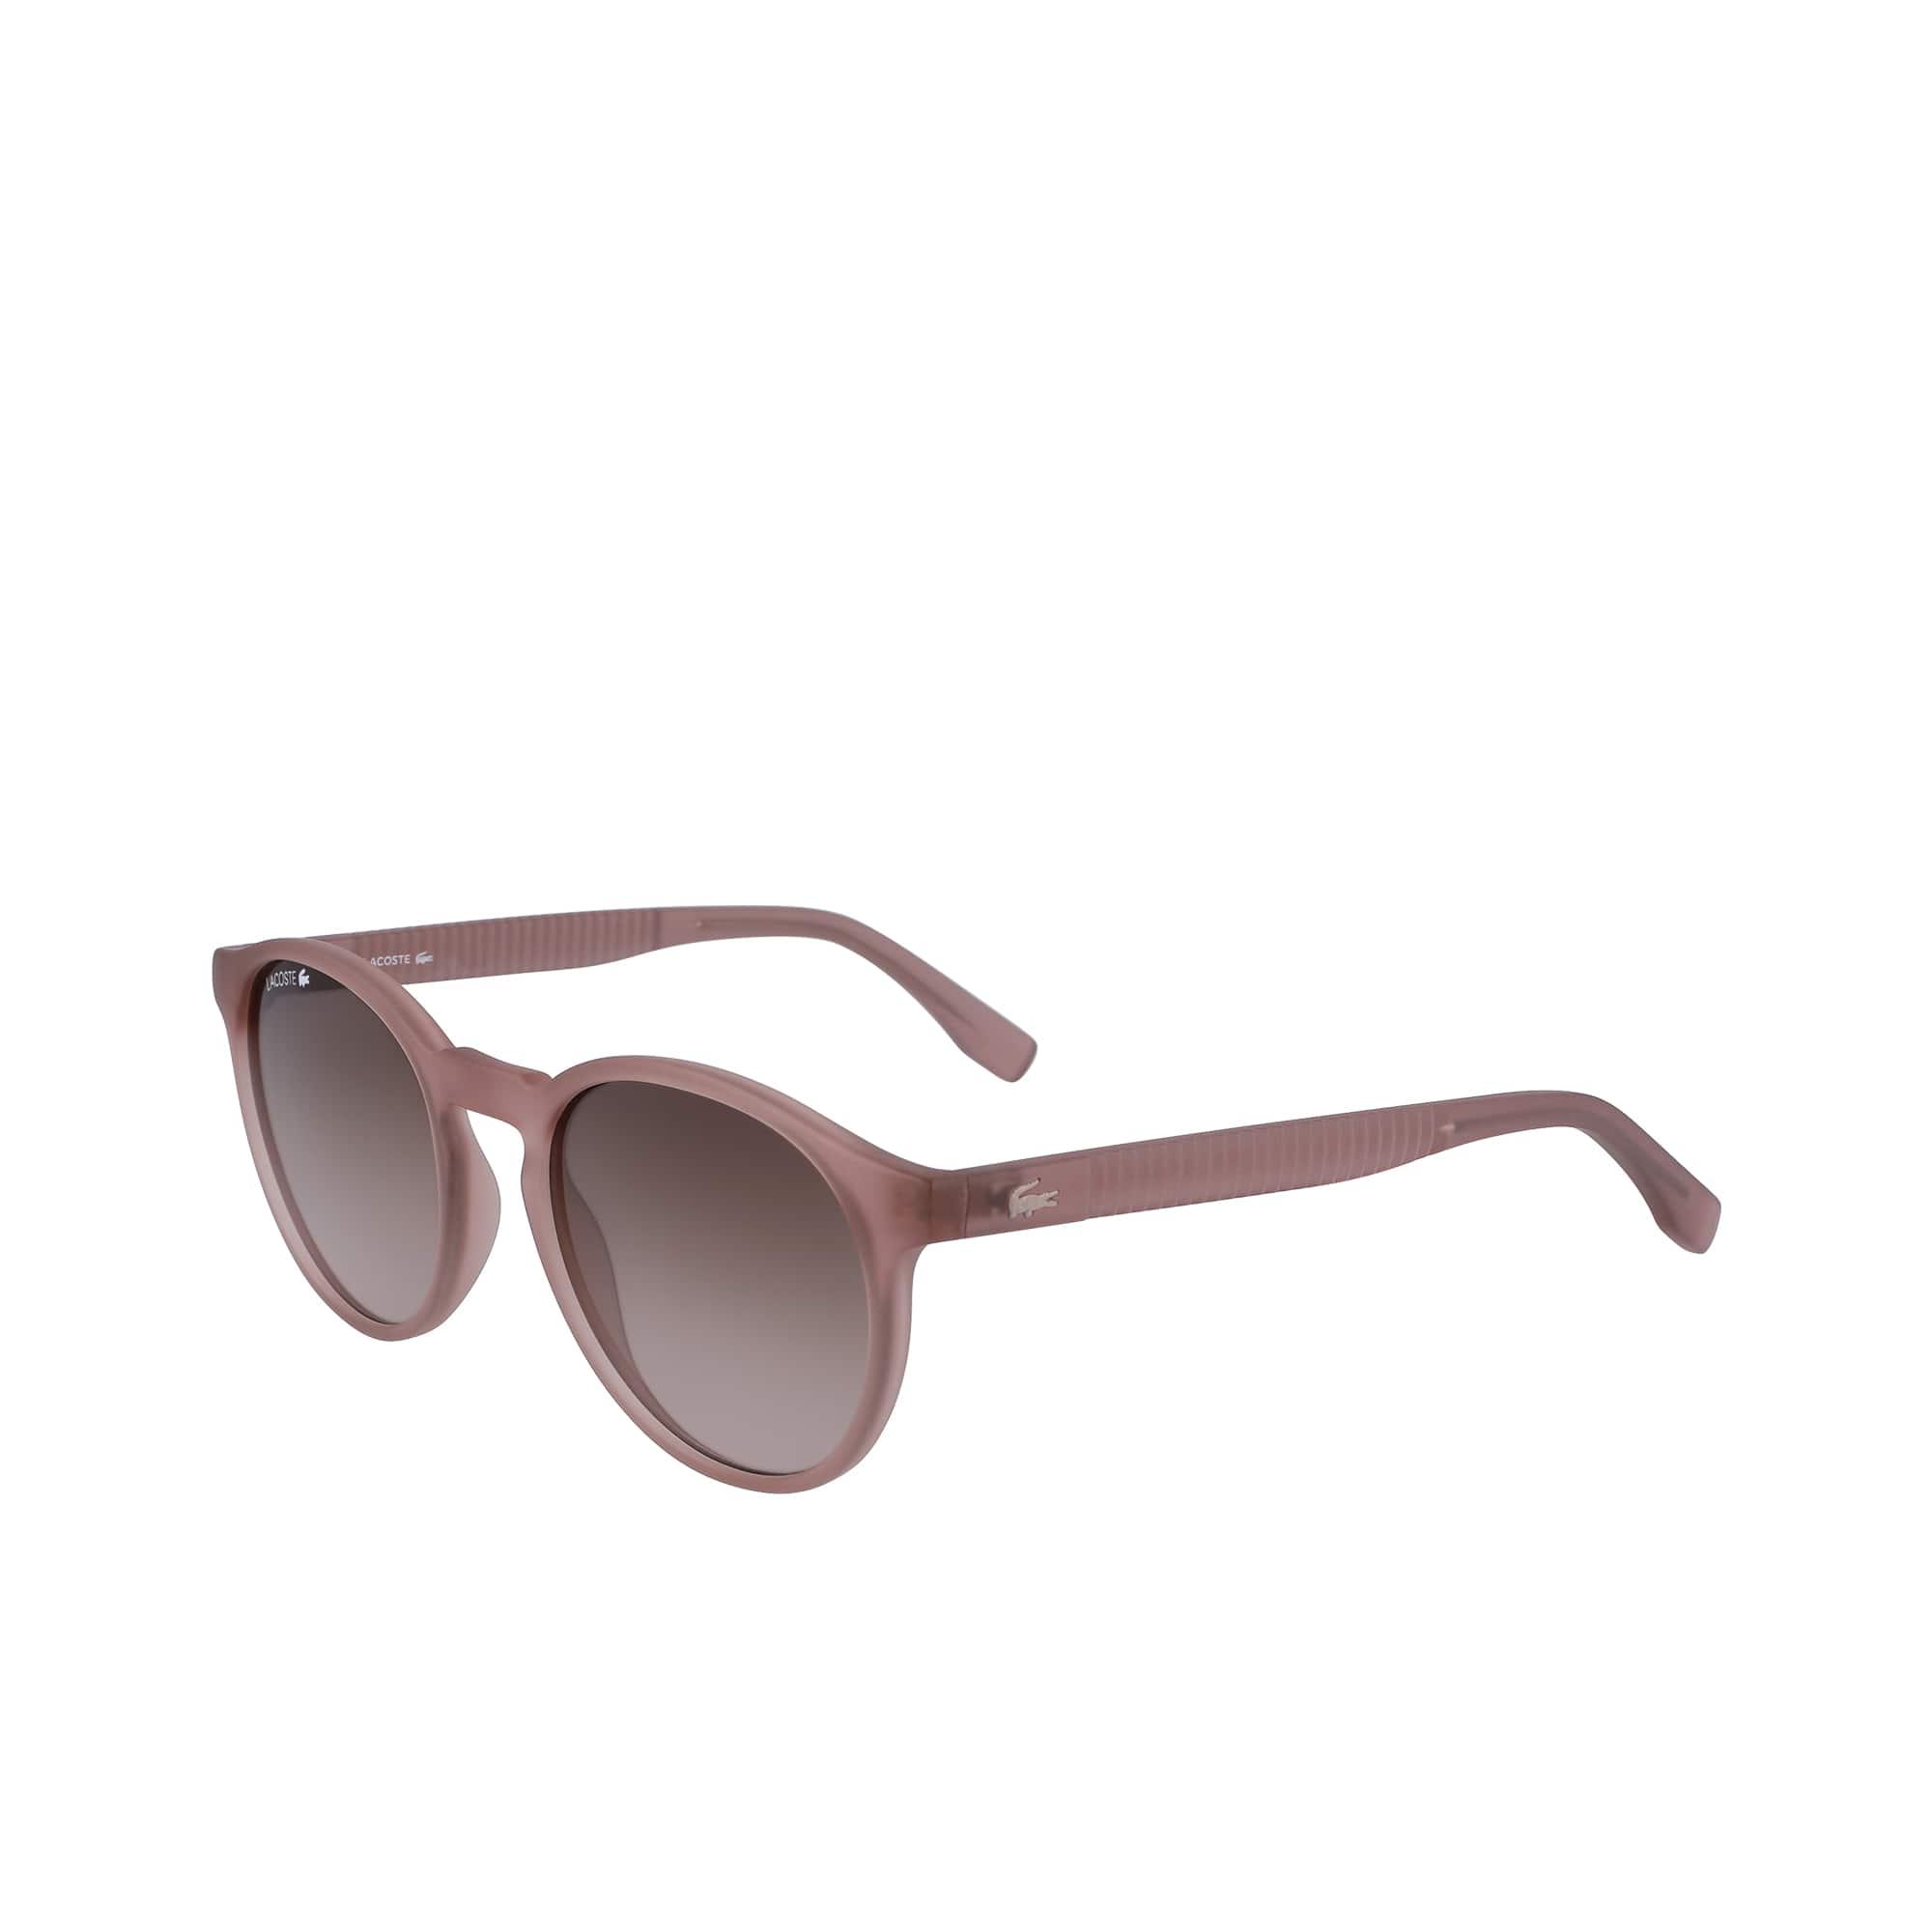 cf7016e22af7 Sunglasses for women